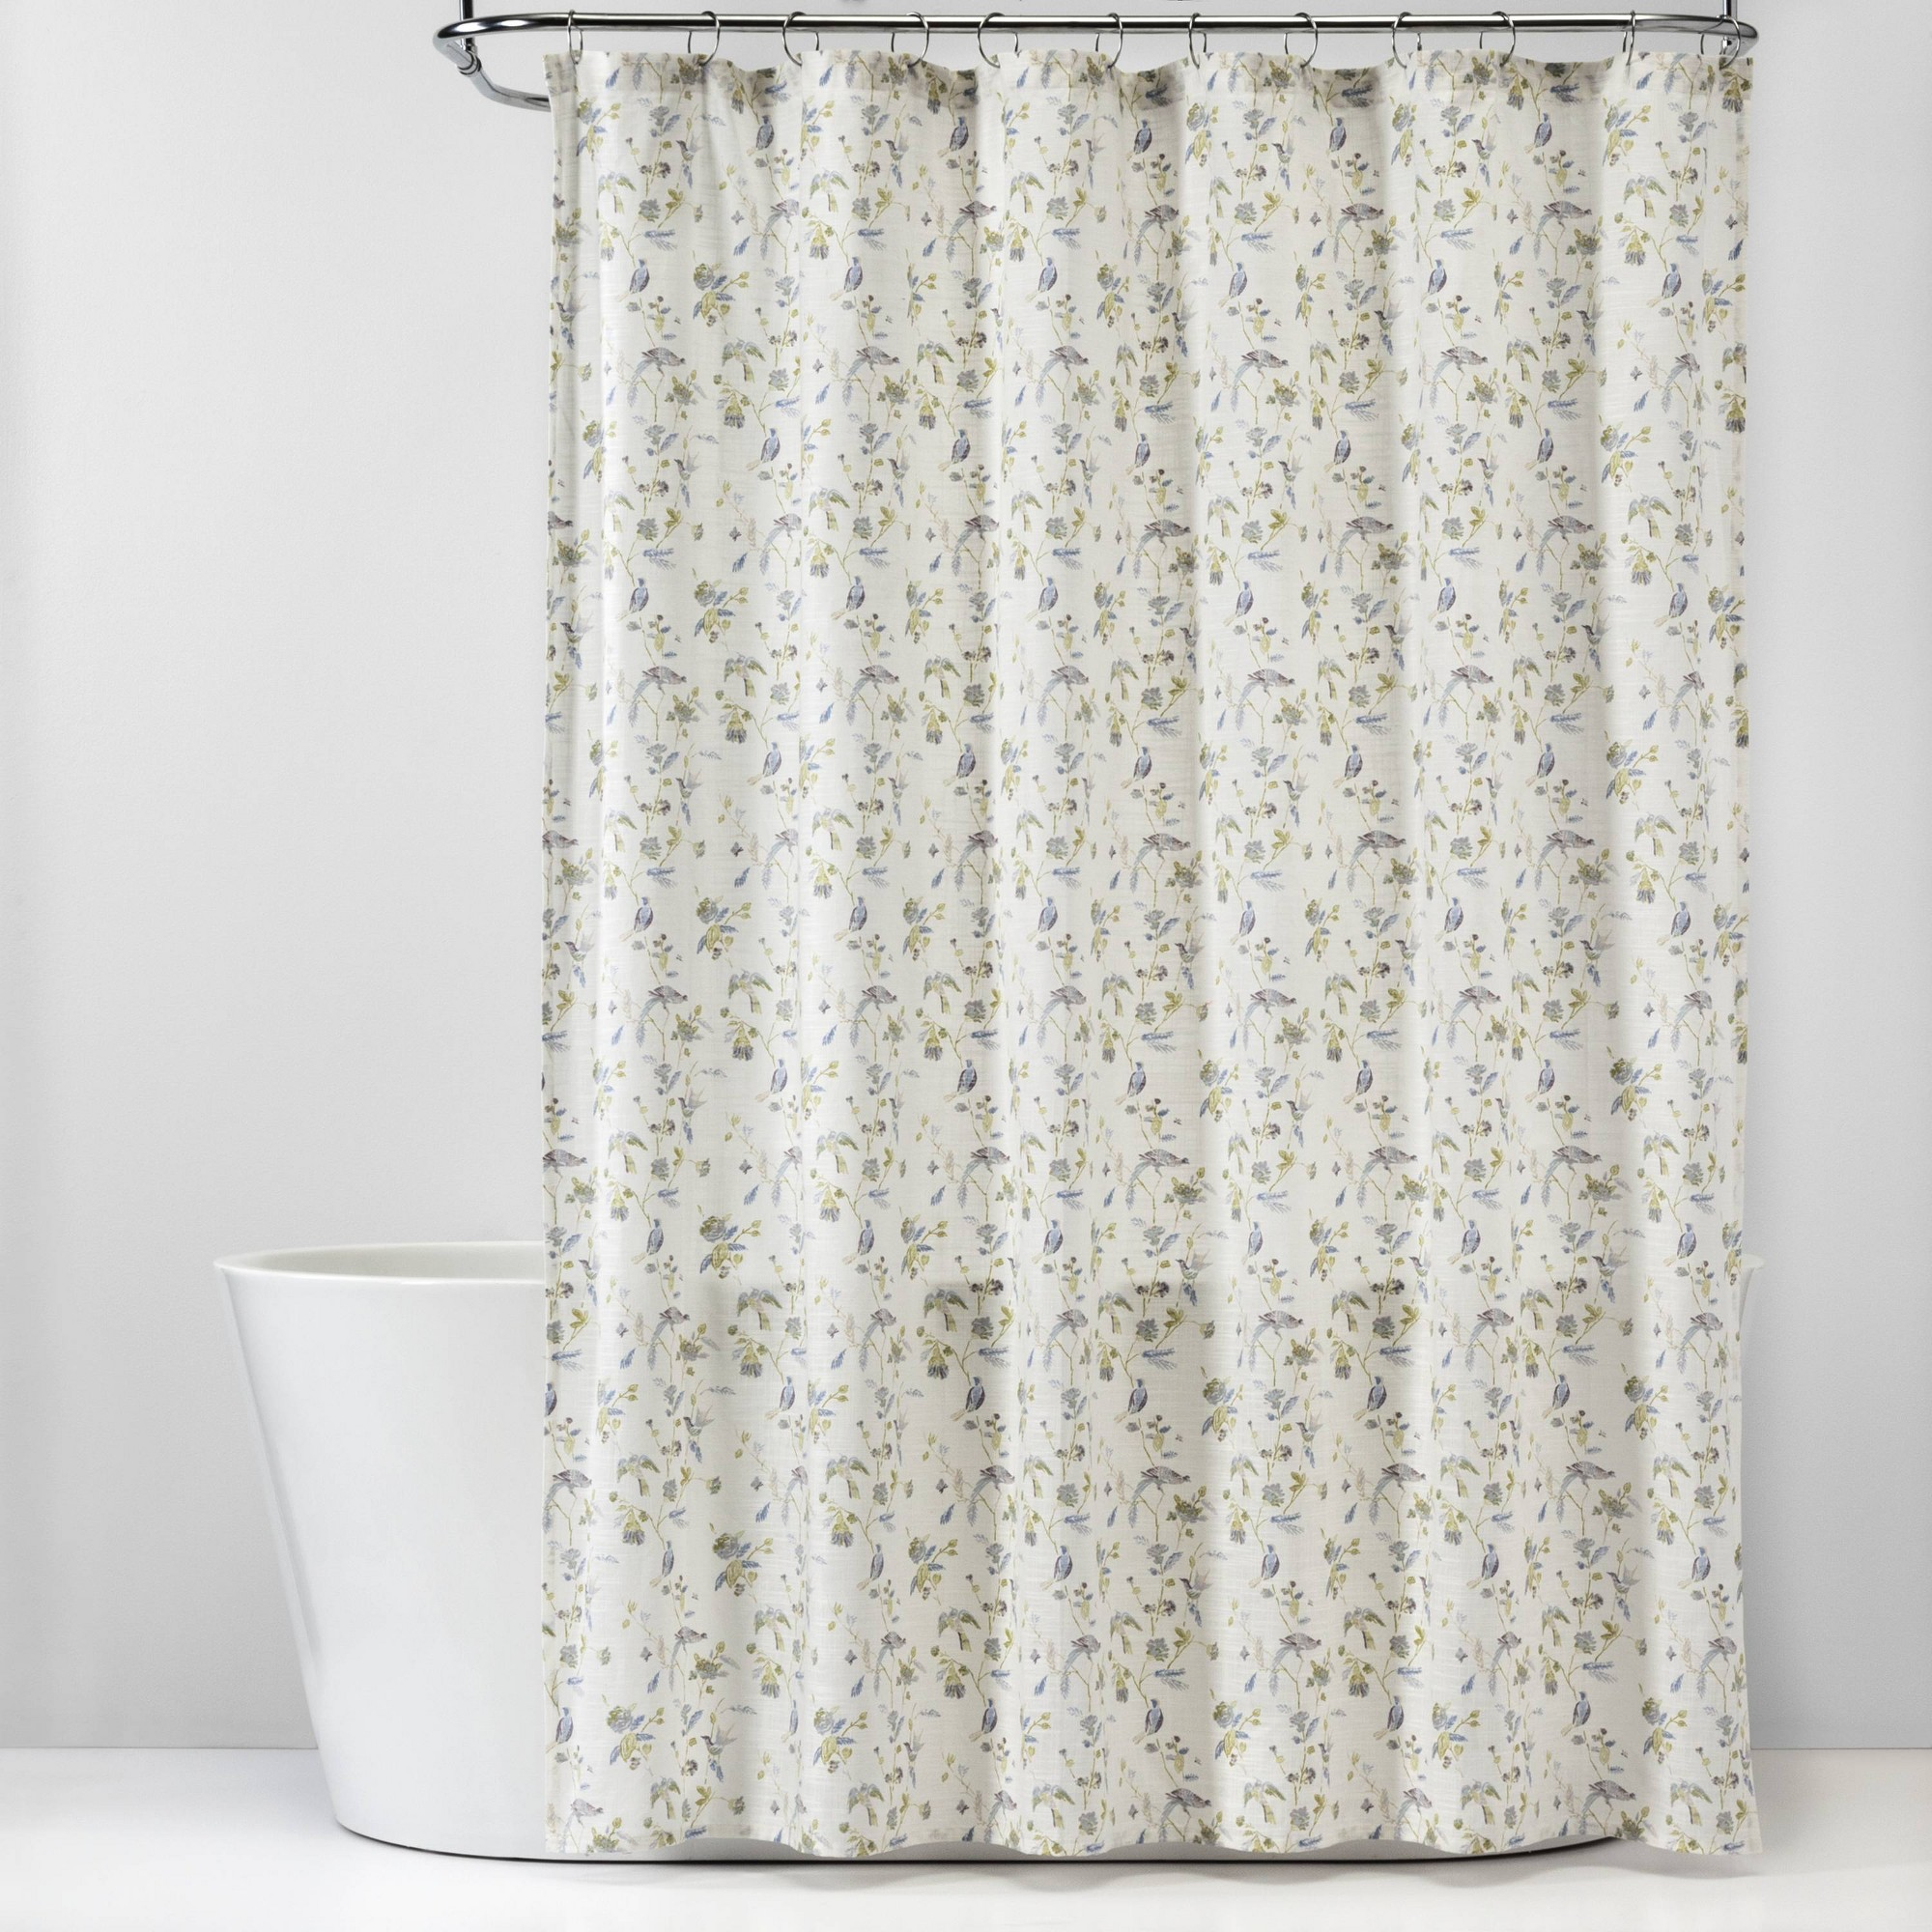 Wing Print Cotton Shower Curtain White Threshold Adult Unisex